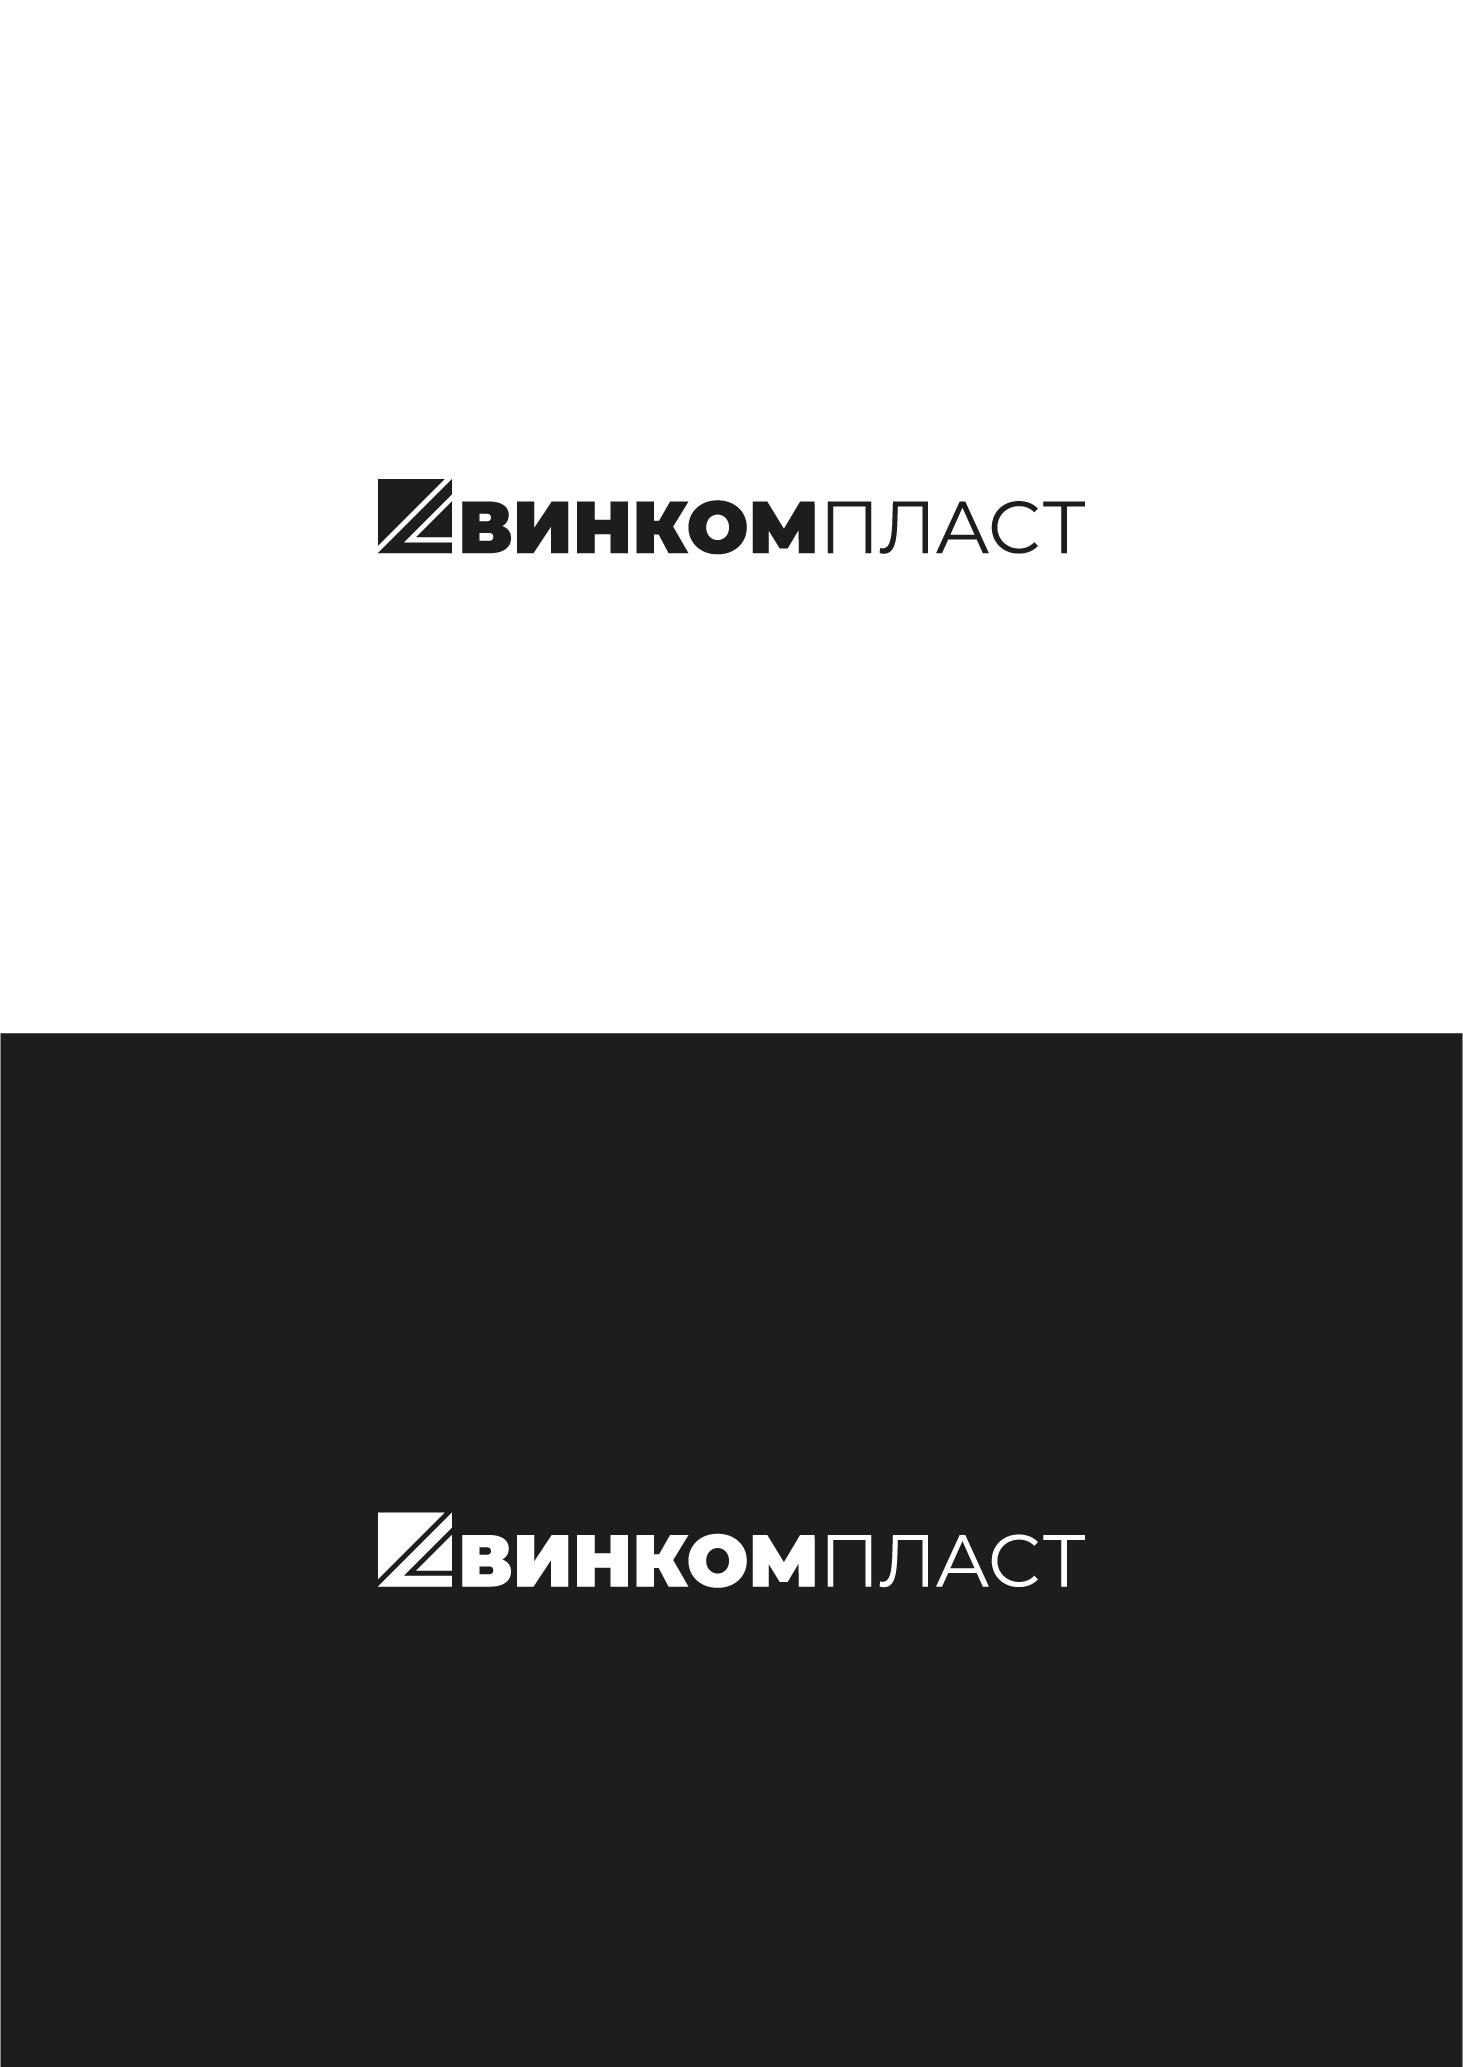 Логотип, фавикон и визитка для компании Винком Пласт  фото f_6265c379151e2347.png